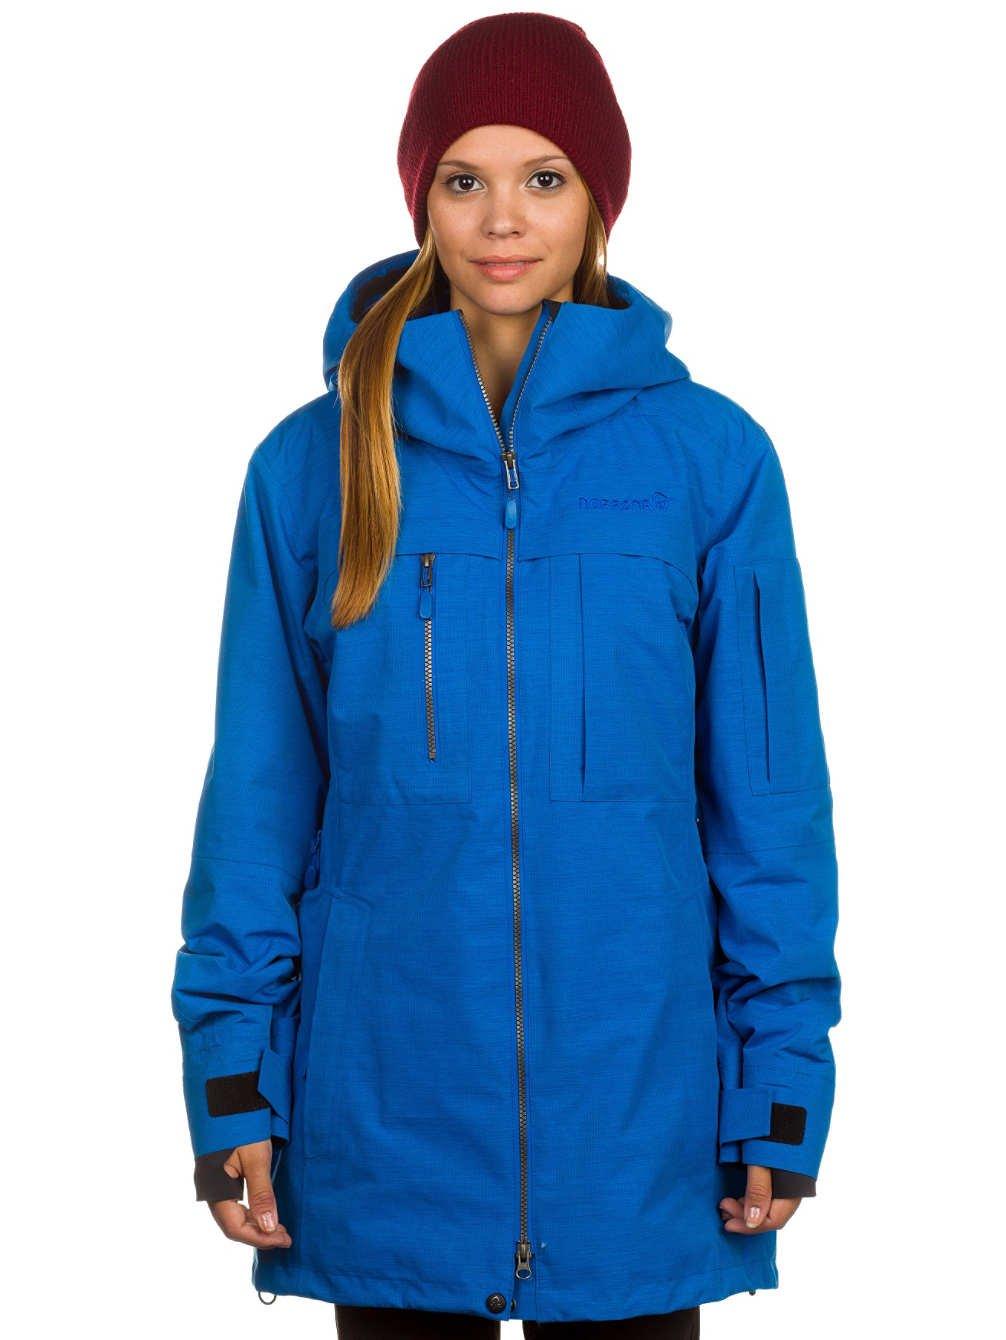 Damen Snowboard Jacke Norrona Roldal Gore Tex Prima Loft Jacket